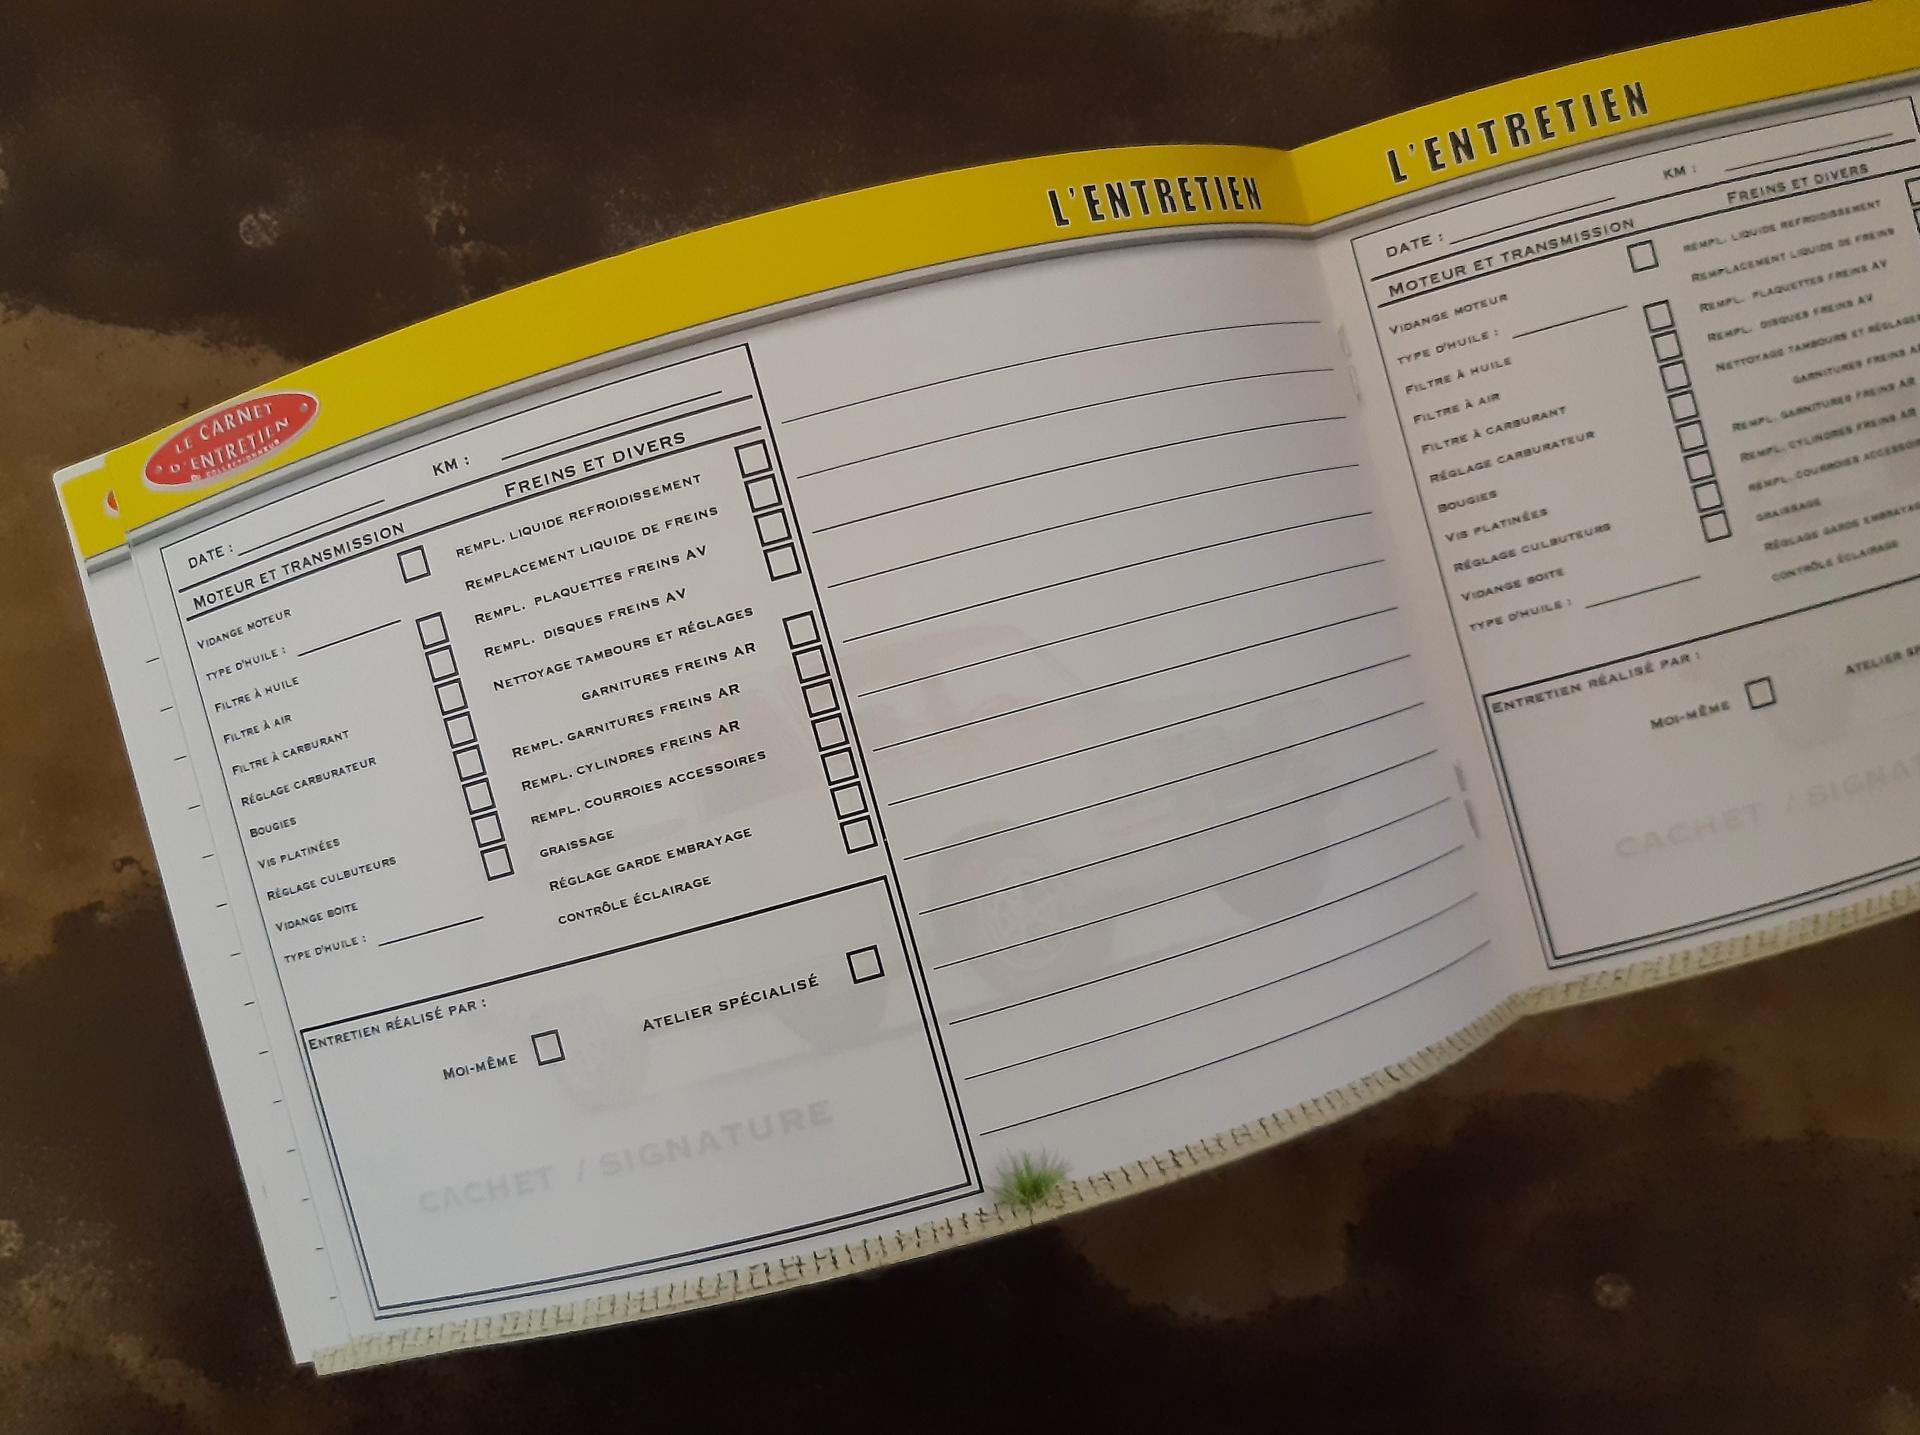 carnet d'entretien Renault 16 R16